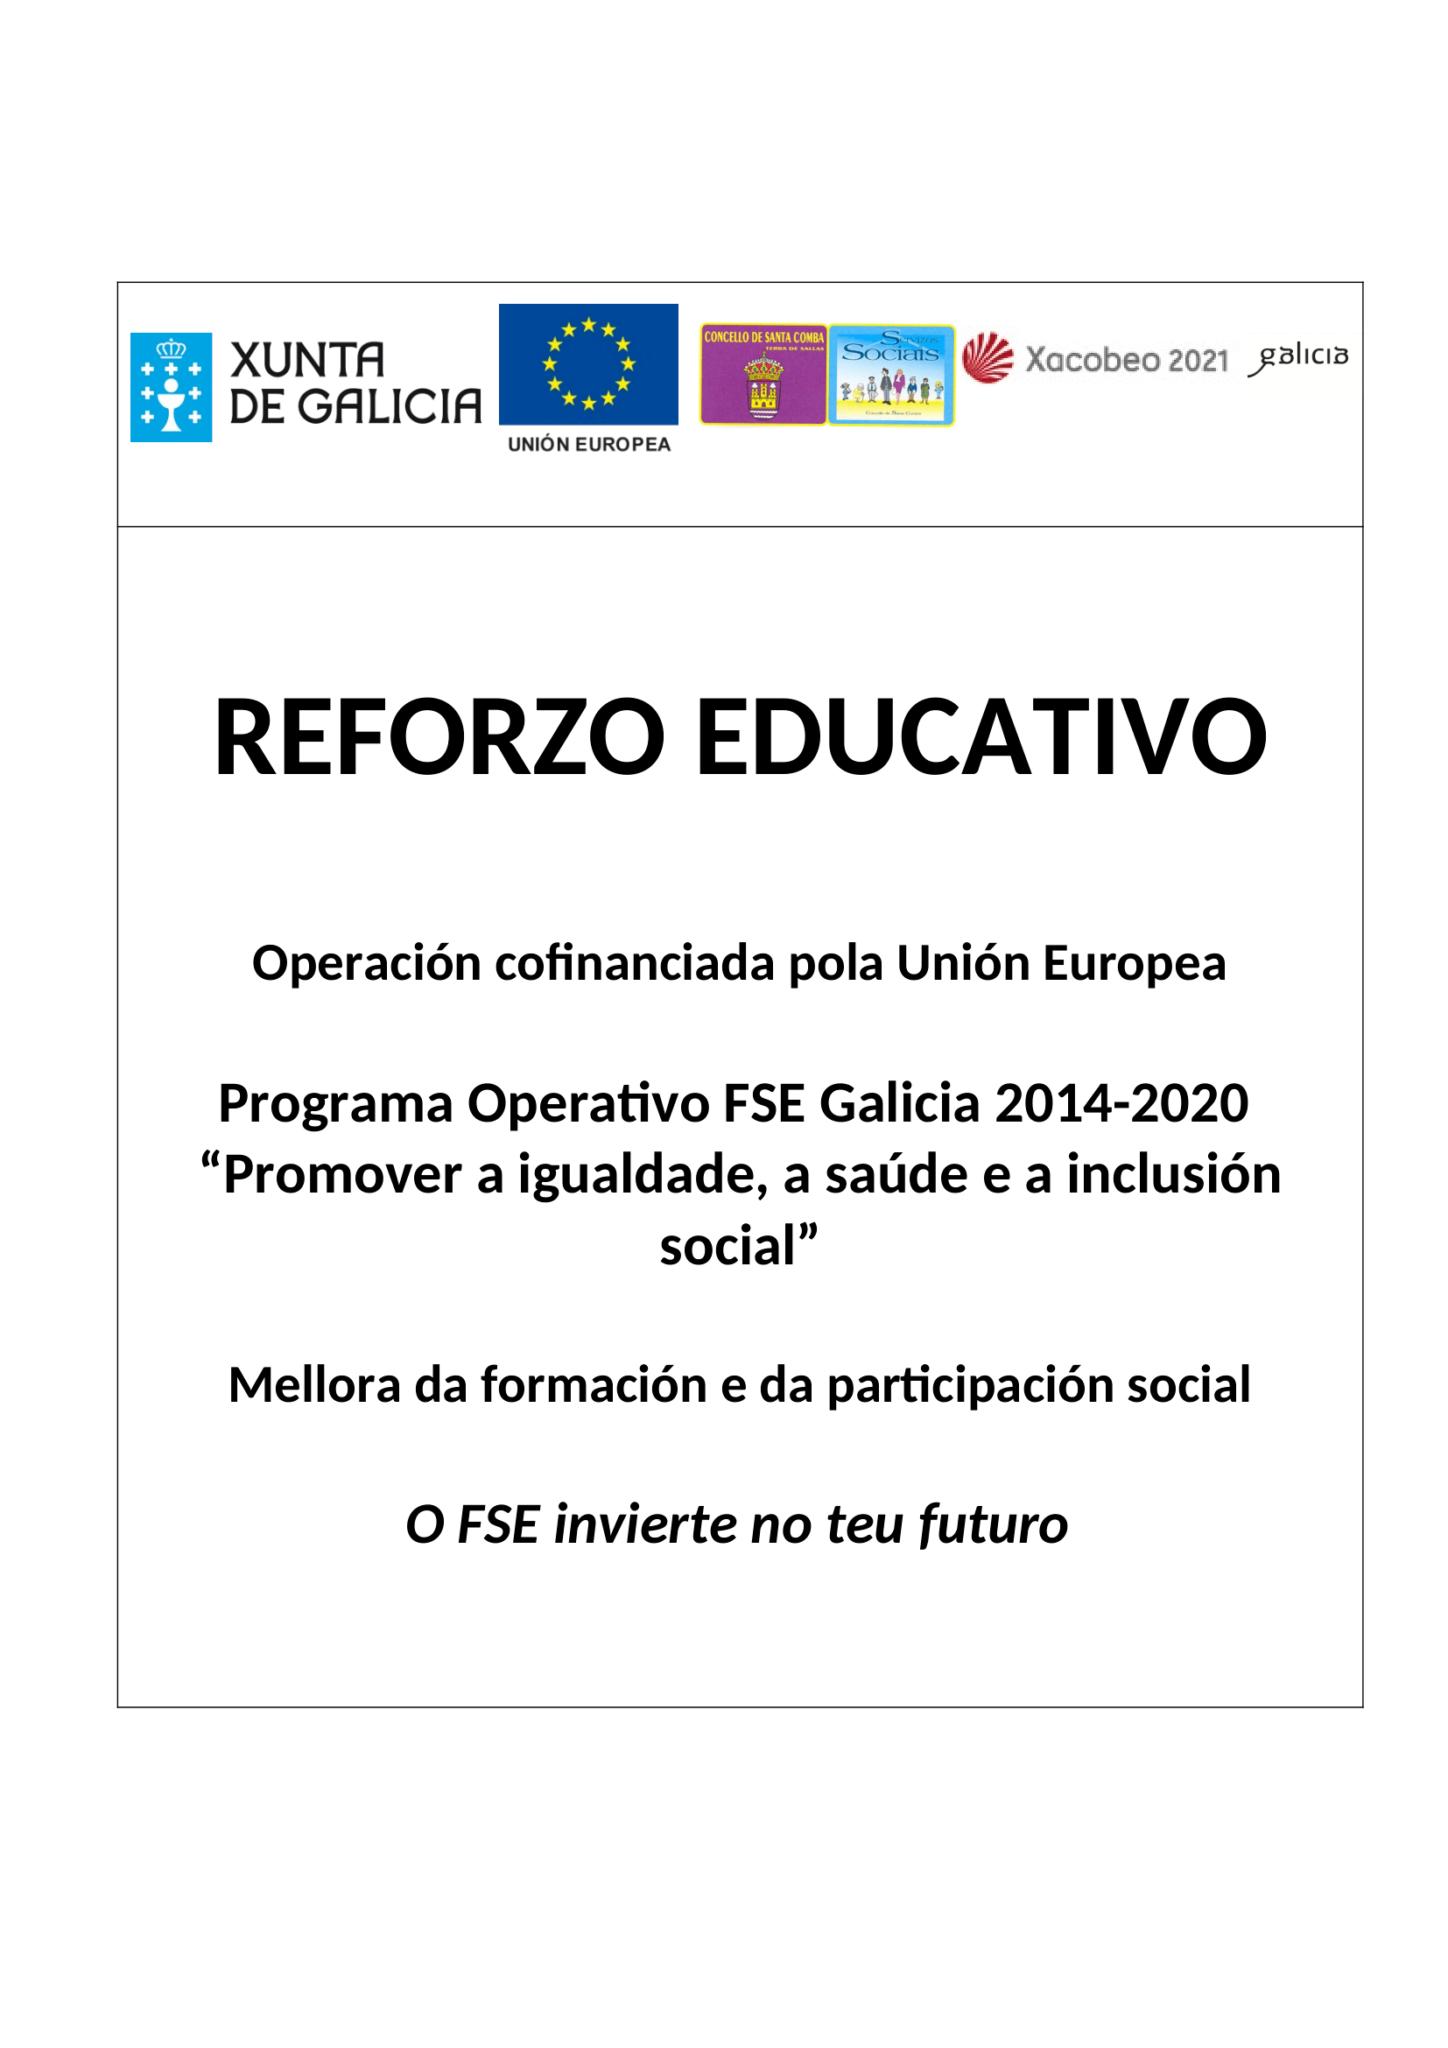 2019-12-05-Cartel-reforzo-educativo